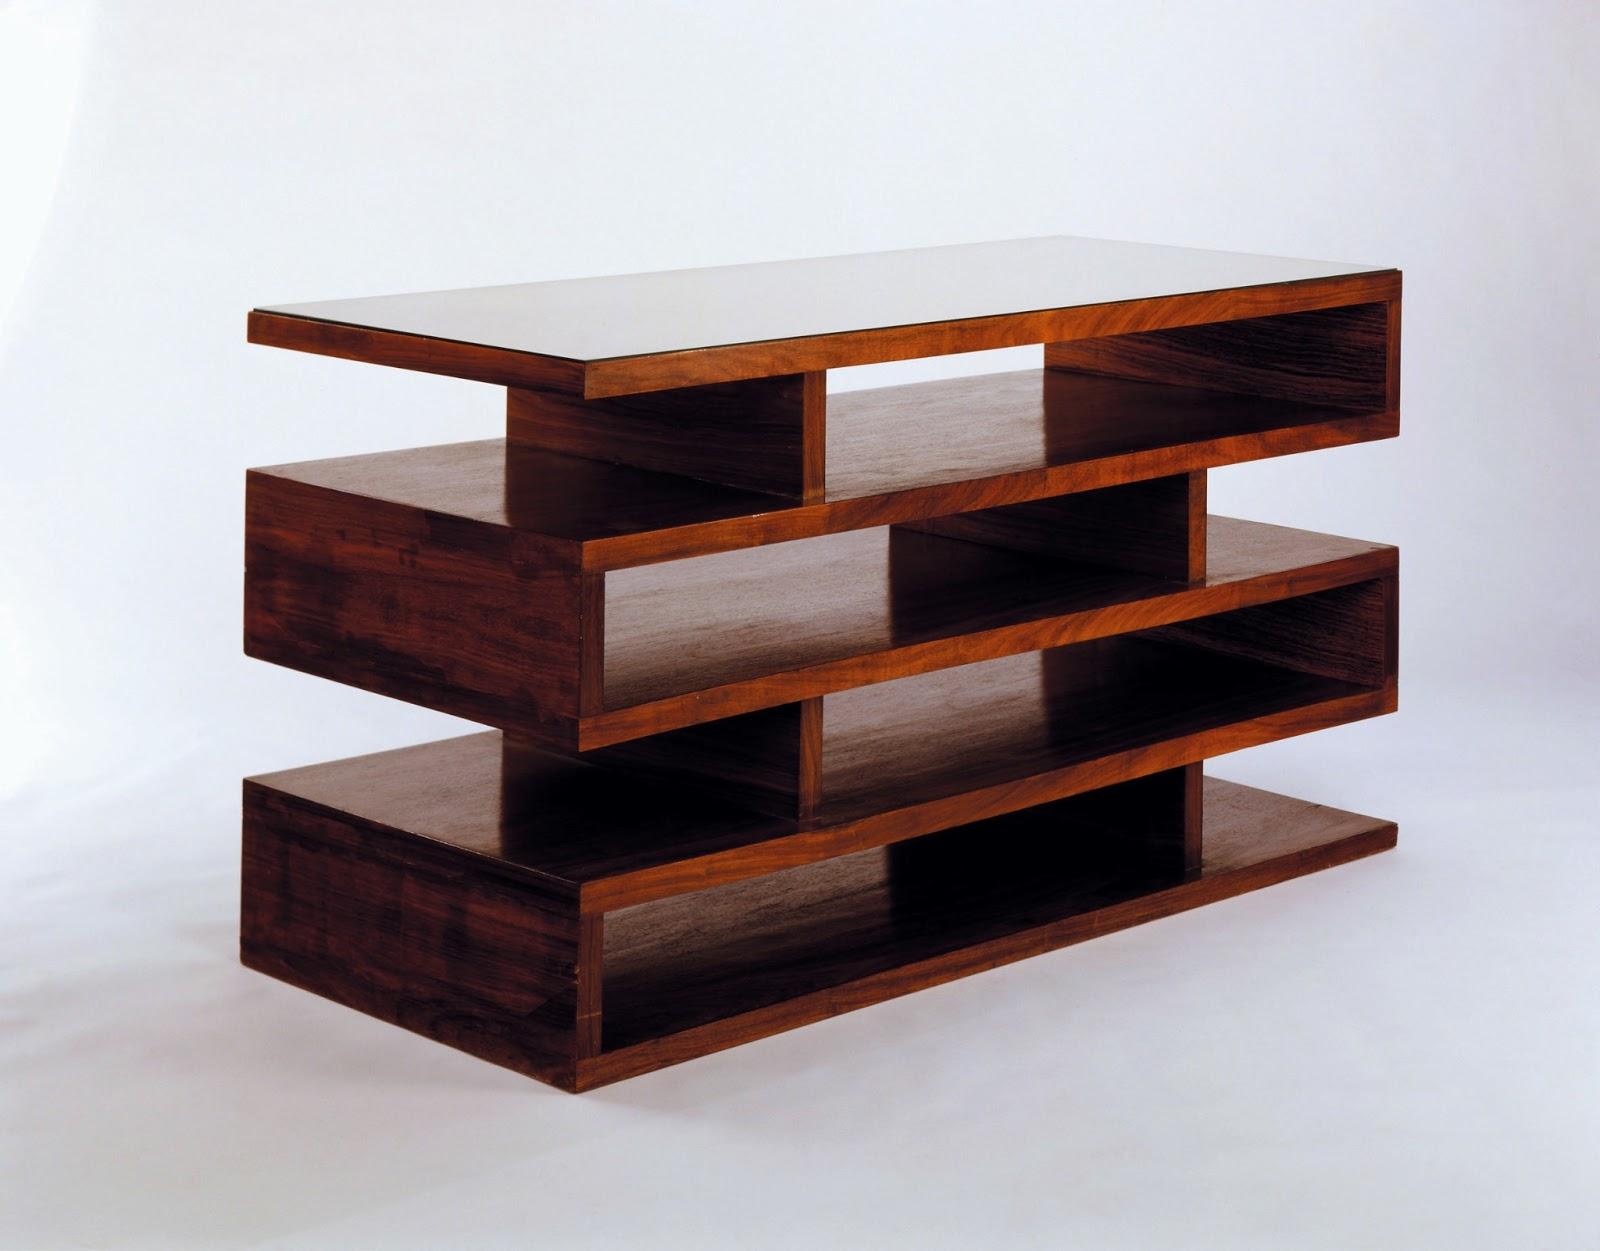 Ziren zhou the bauhaus style for Bauhaus pictures